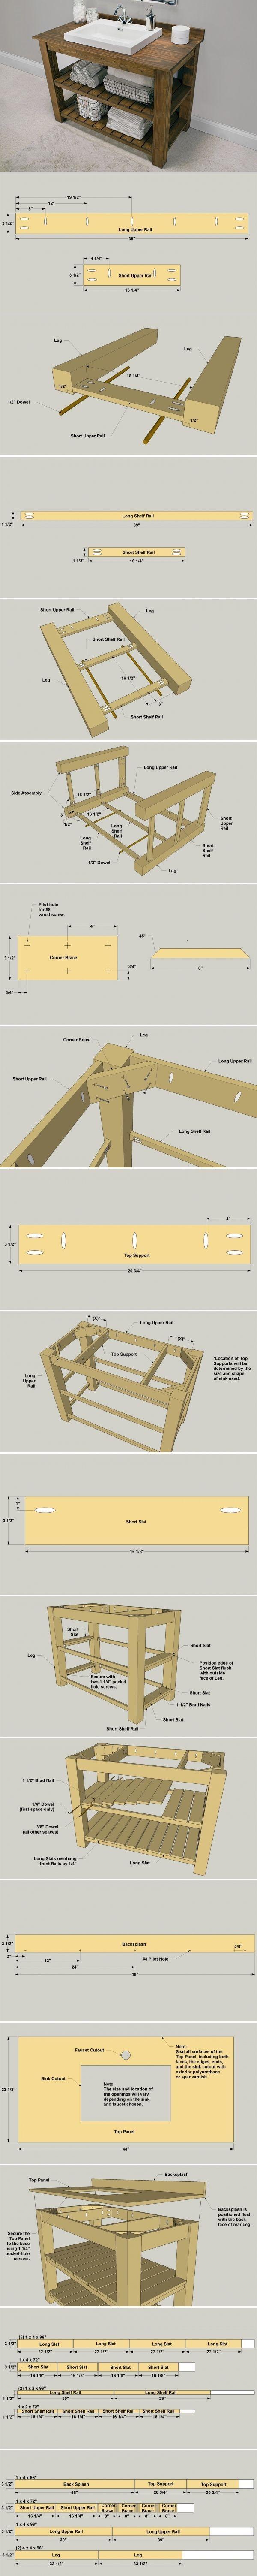 5 x 8 badezimmer design-ideen  rustic style ideas with rustic bathroom vanities  neues zuhause